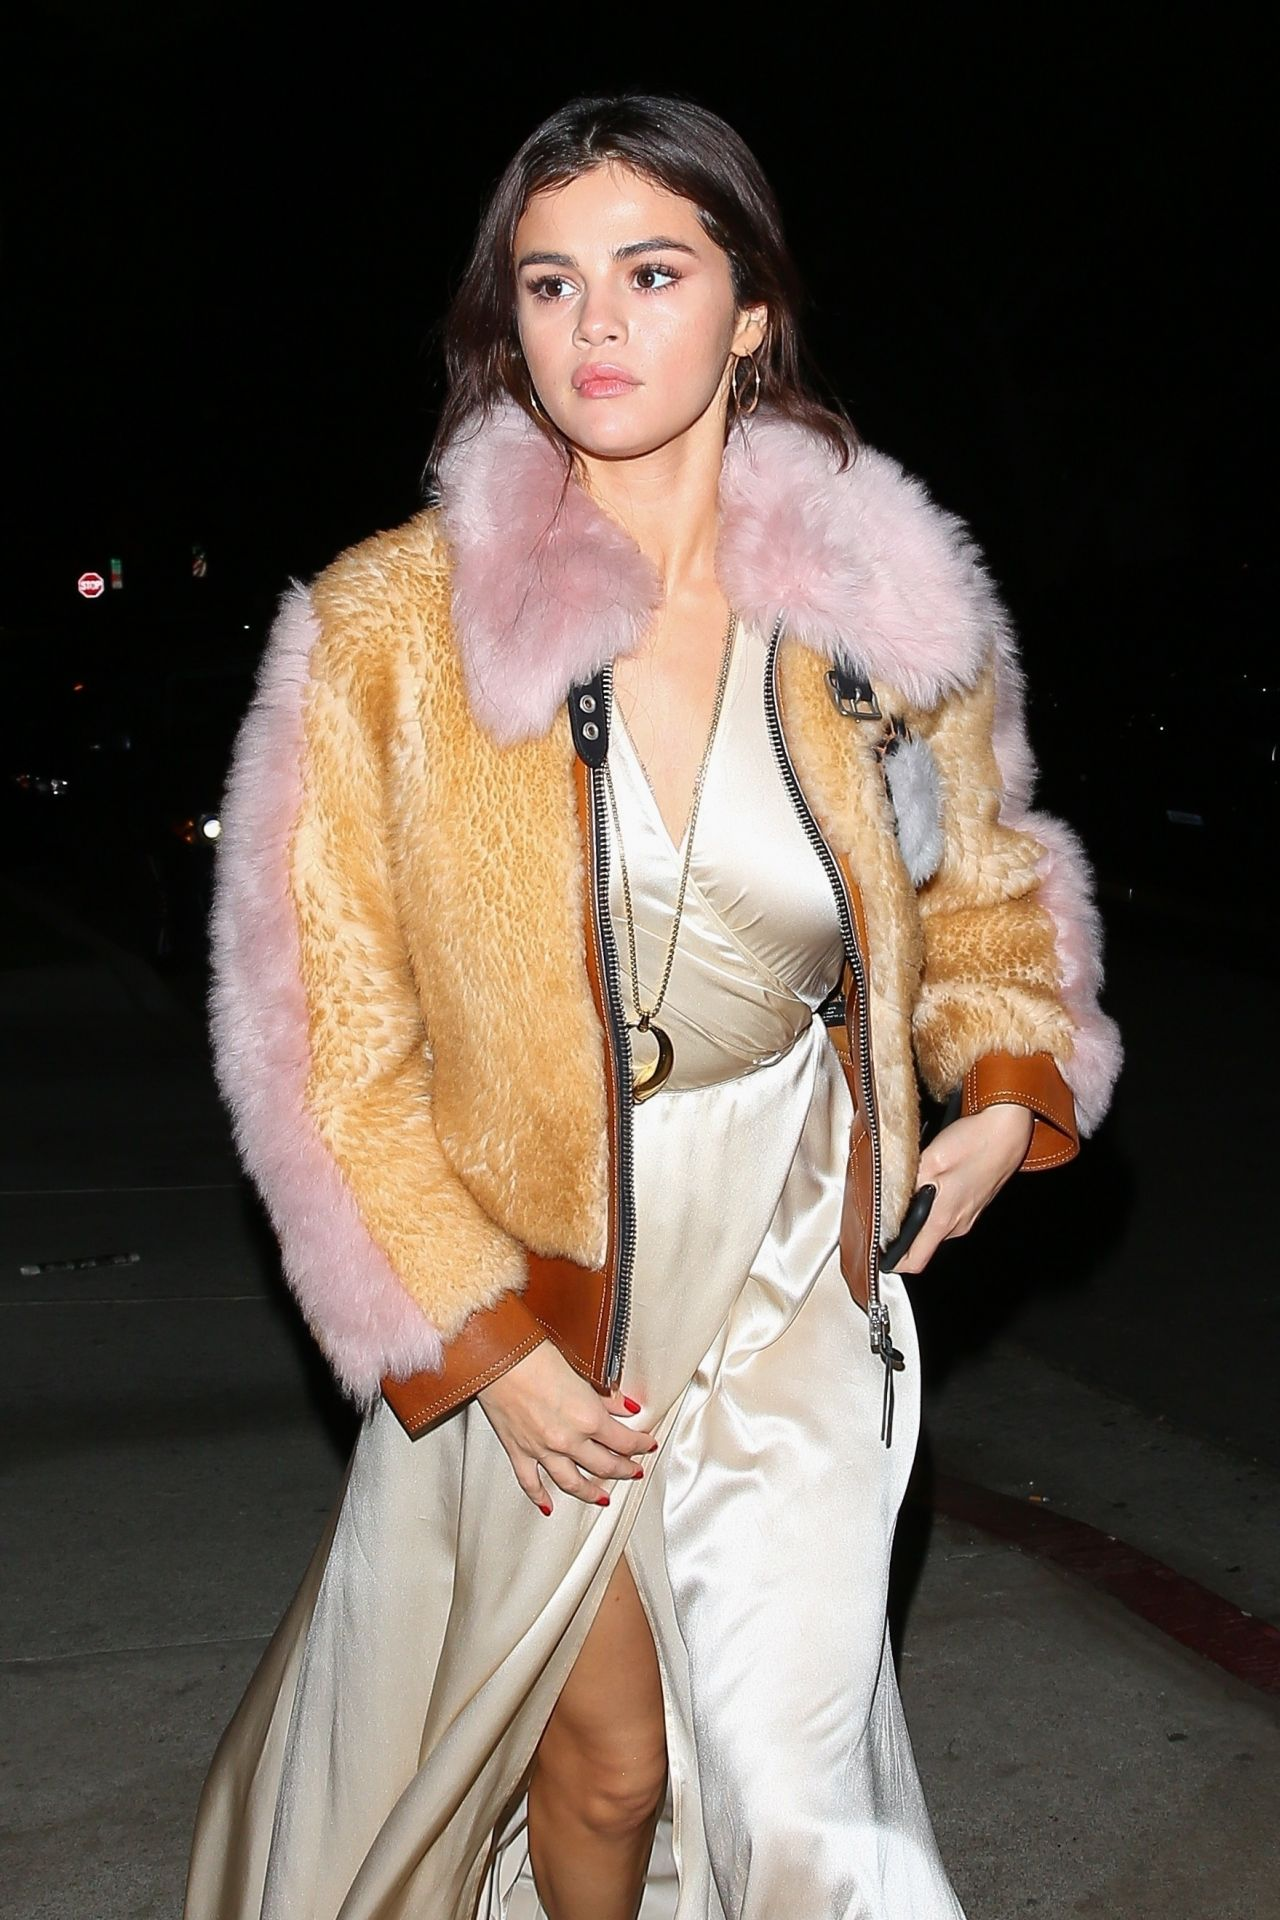 Selena Gomez Night Out Fashion Los Angeles 02 02 2018